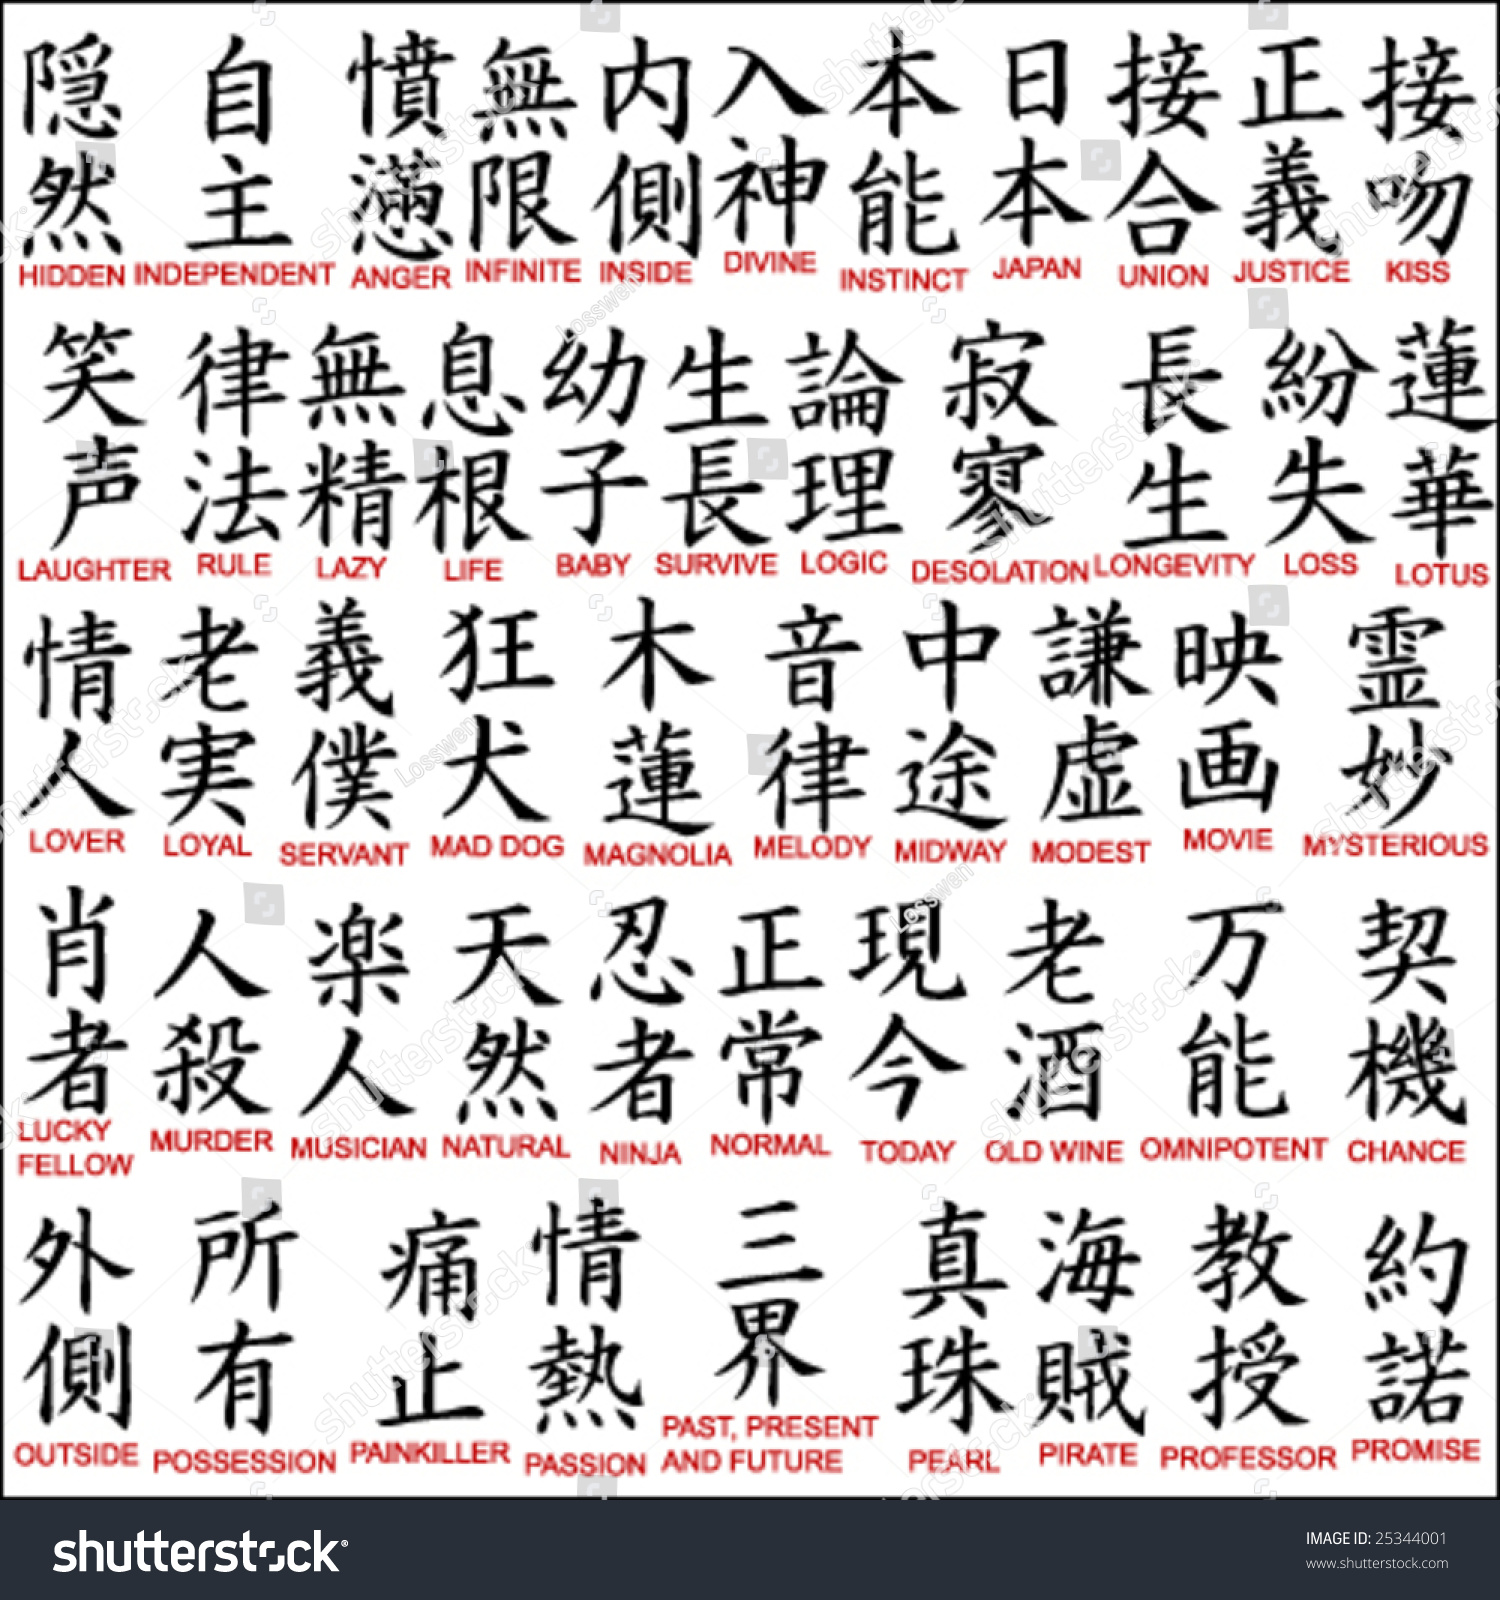 Japanese Kanji Chinese Symbols 8 Stock Vector 2018 25344001